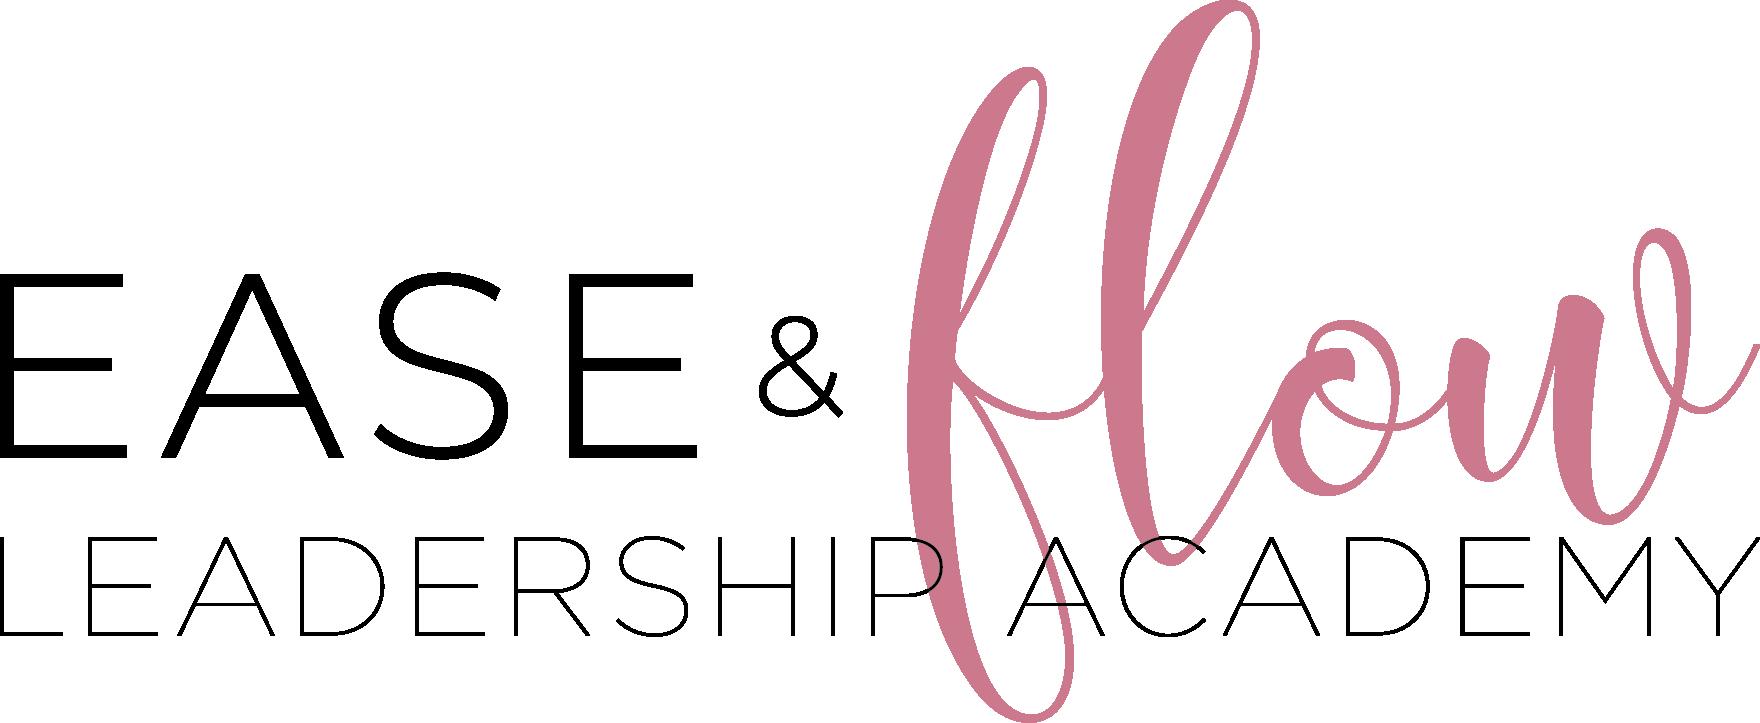 Ease & Flow Leadership Academy